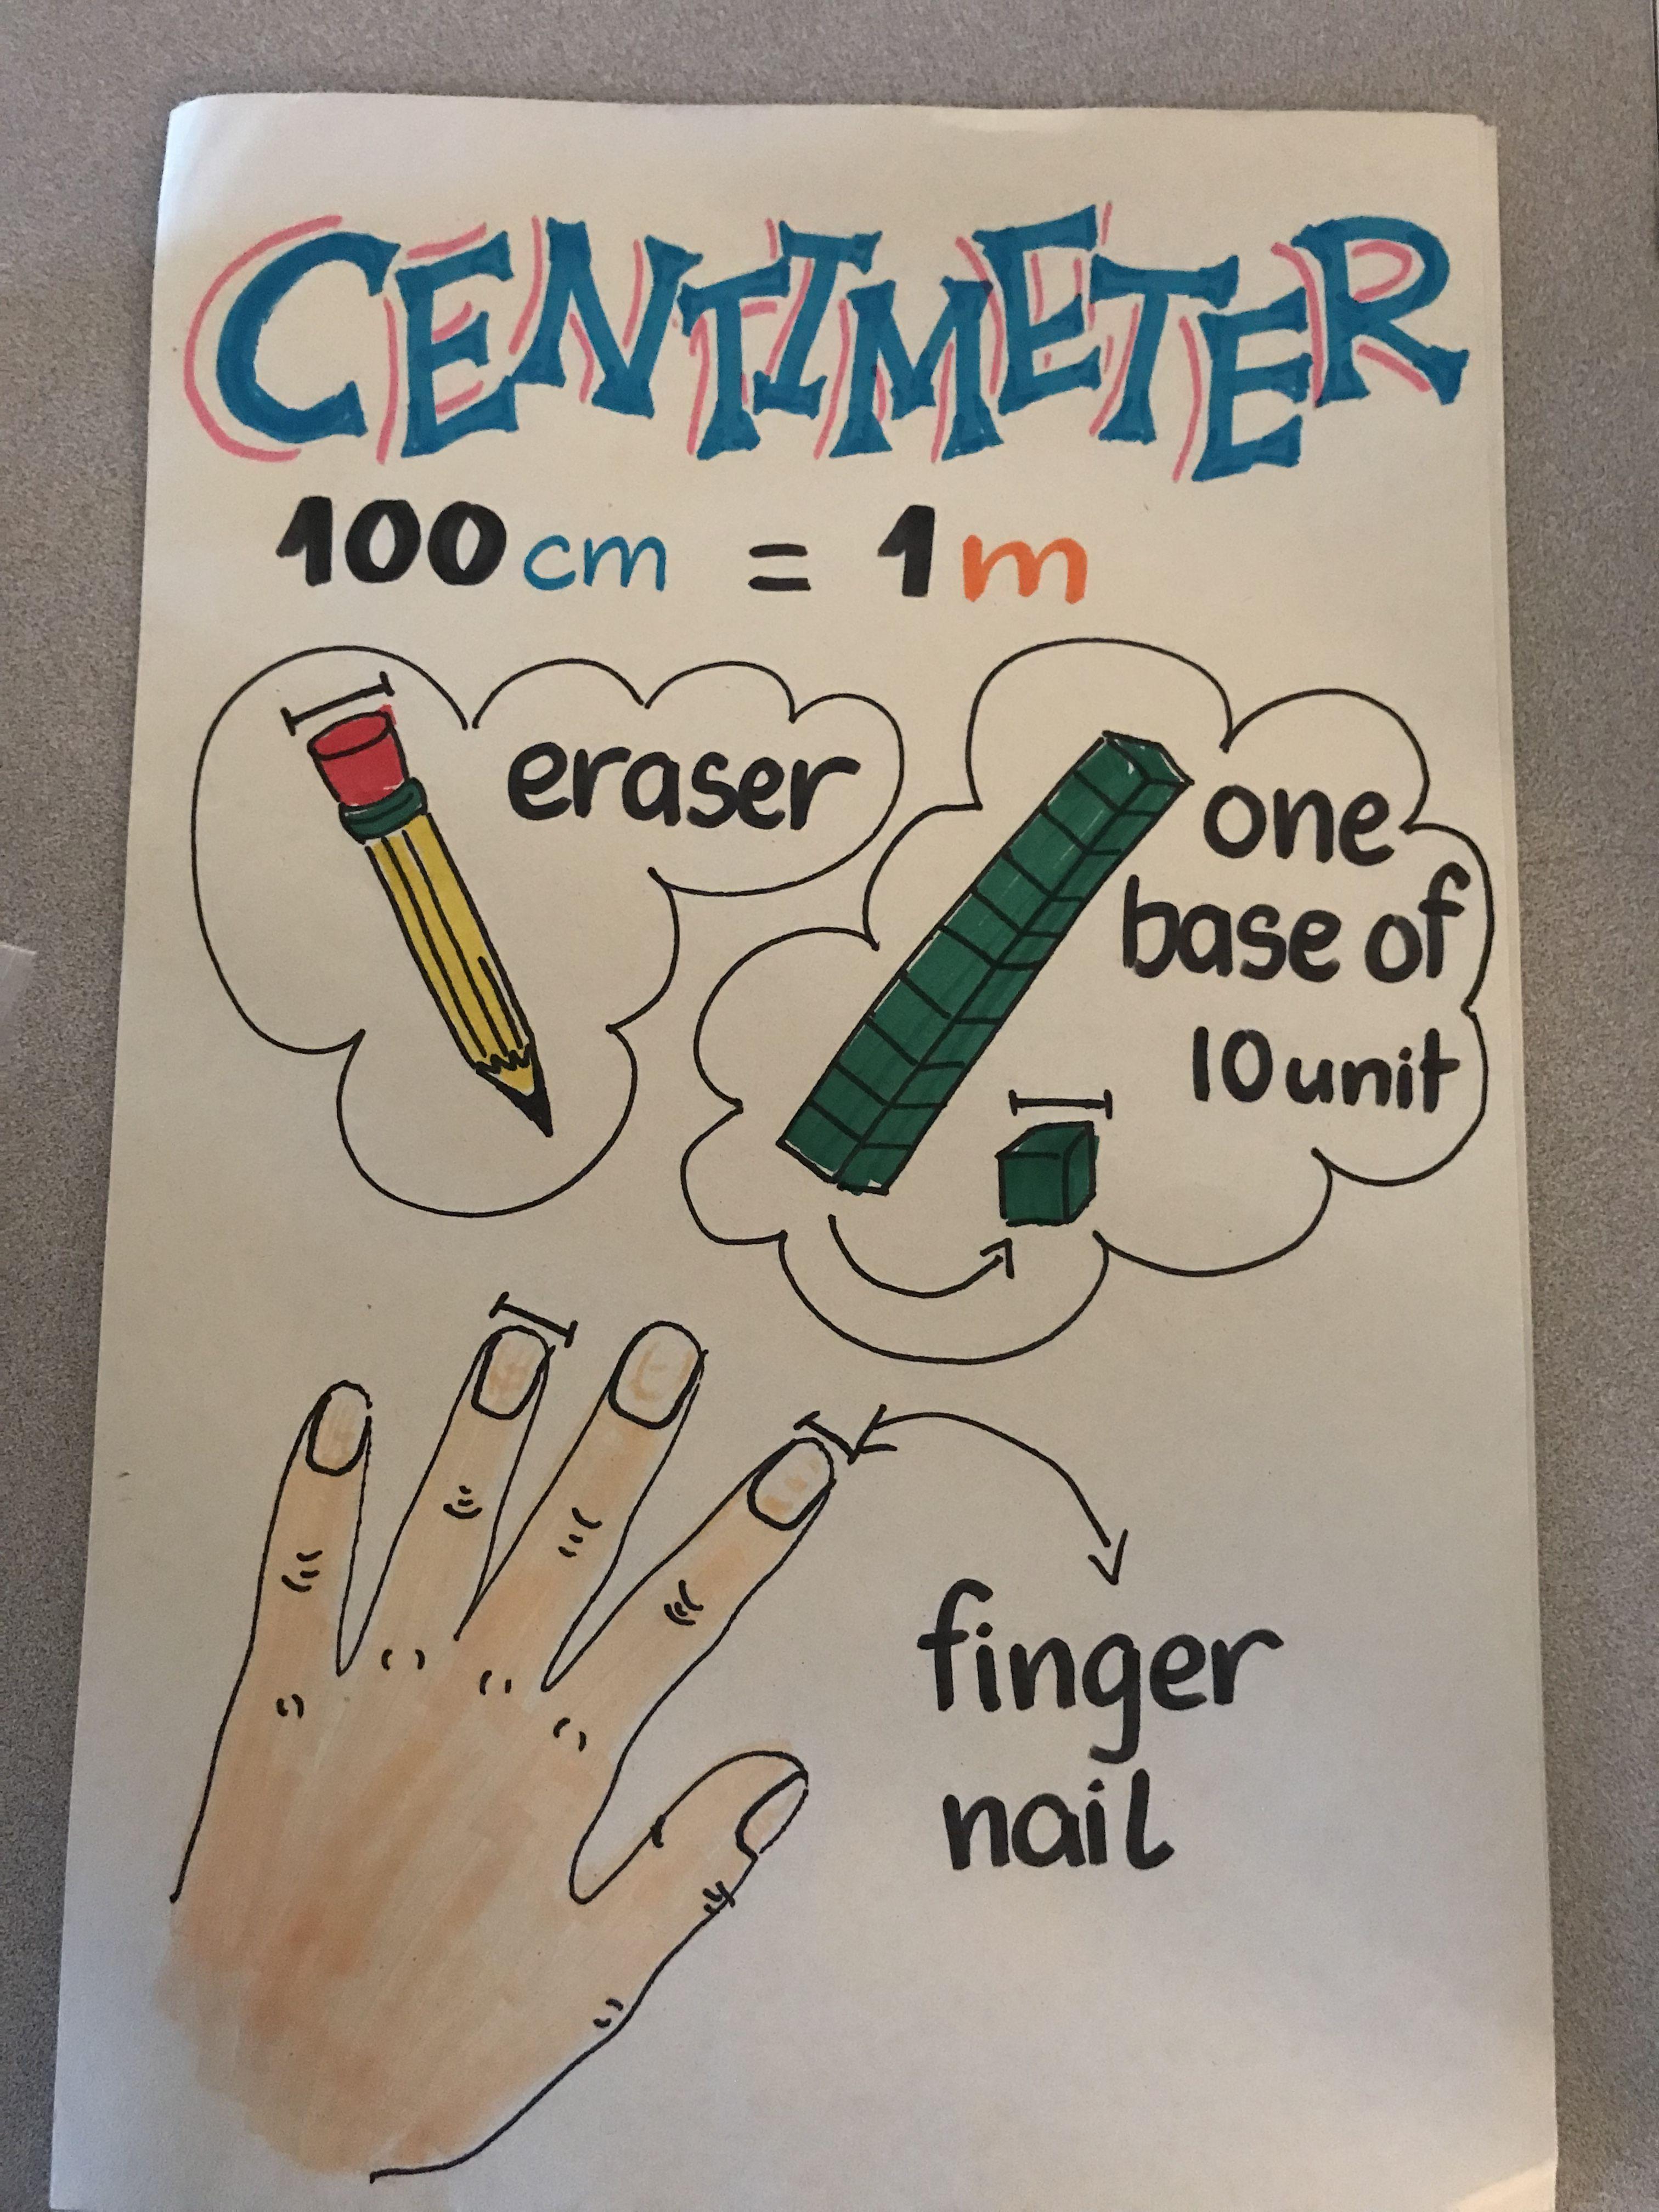 Centimeter Anchor Chart Length Measurement Anchor Chart